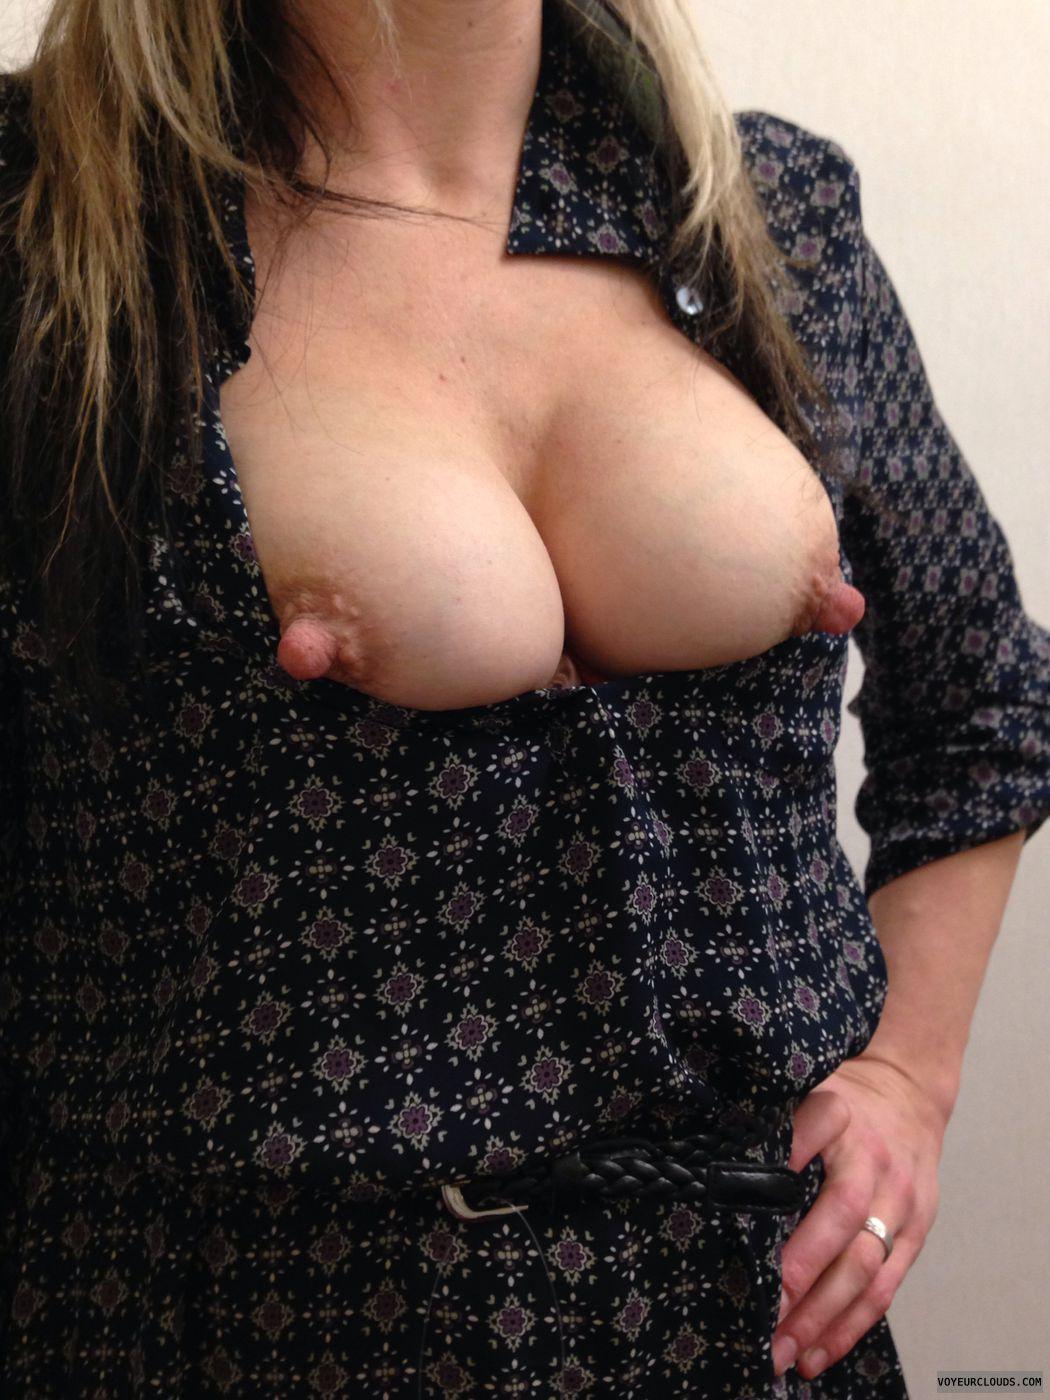 Small boobs hairy pussy